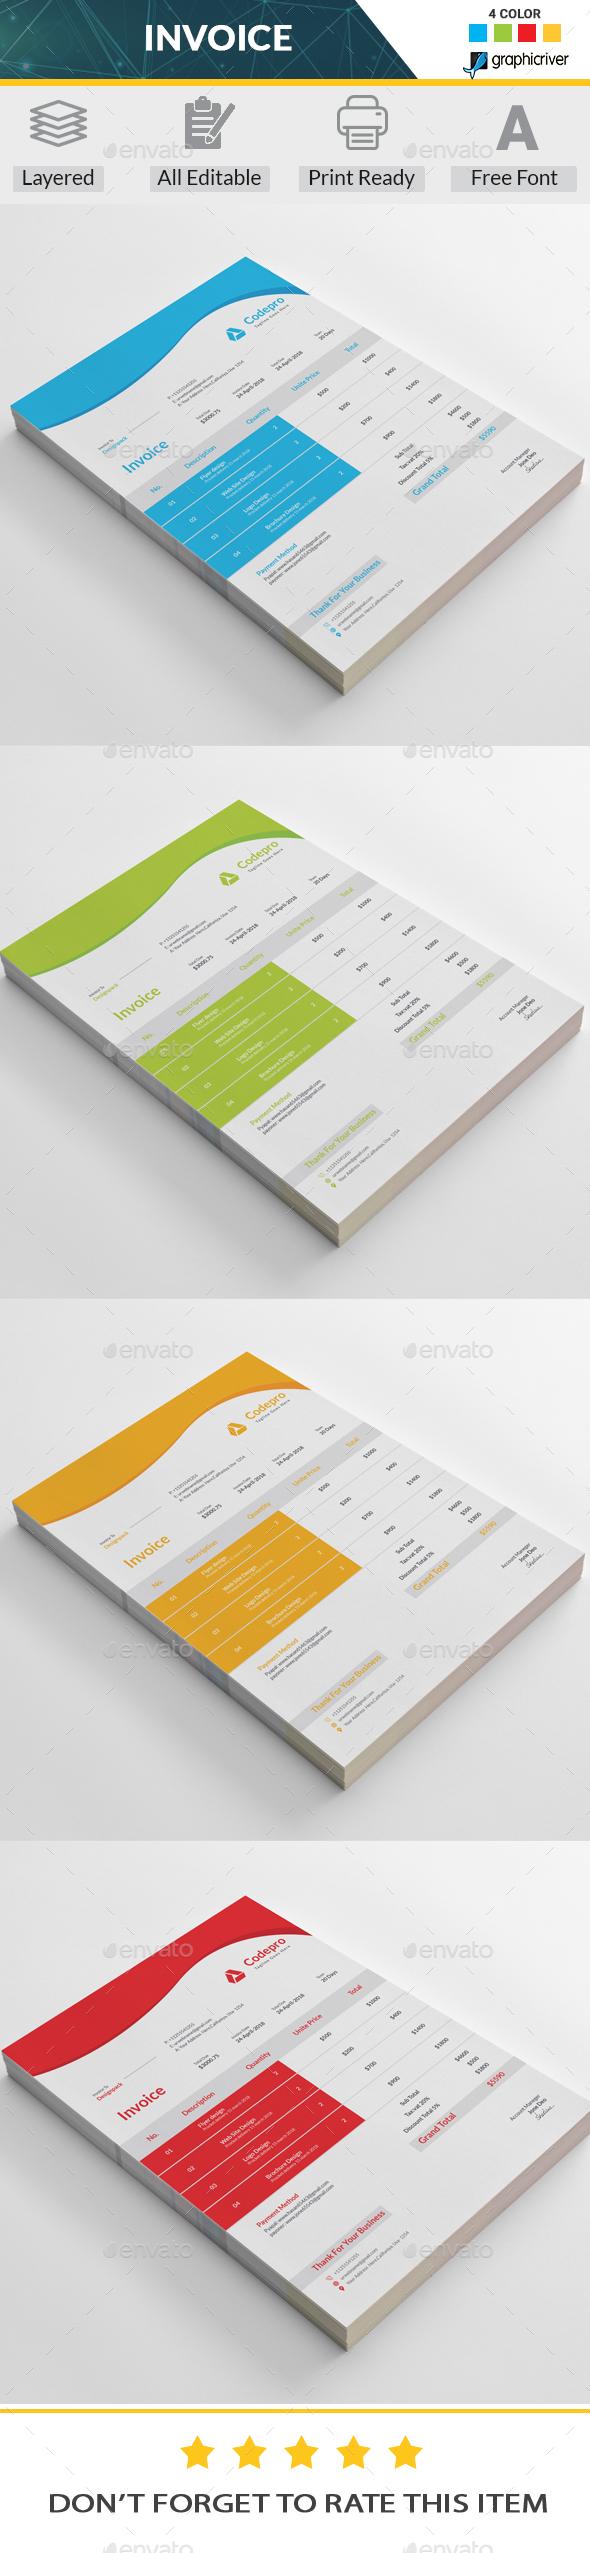 Invoice Template Vector EPS, AI Illustrator | Proposal & Invoice ...